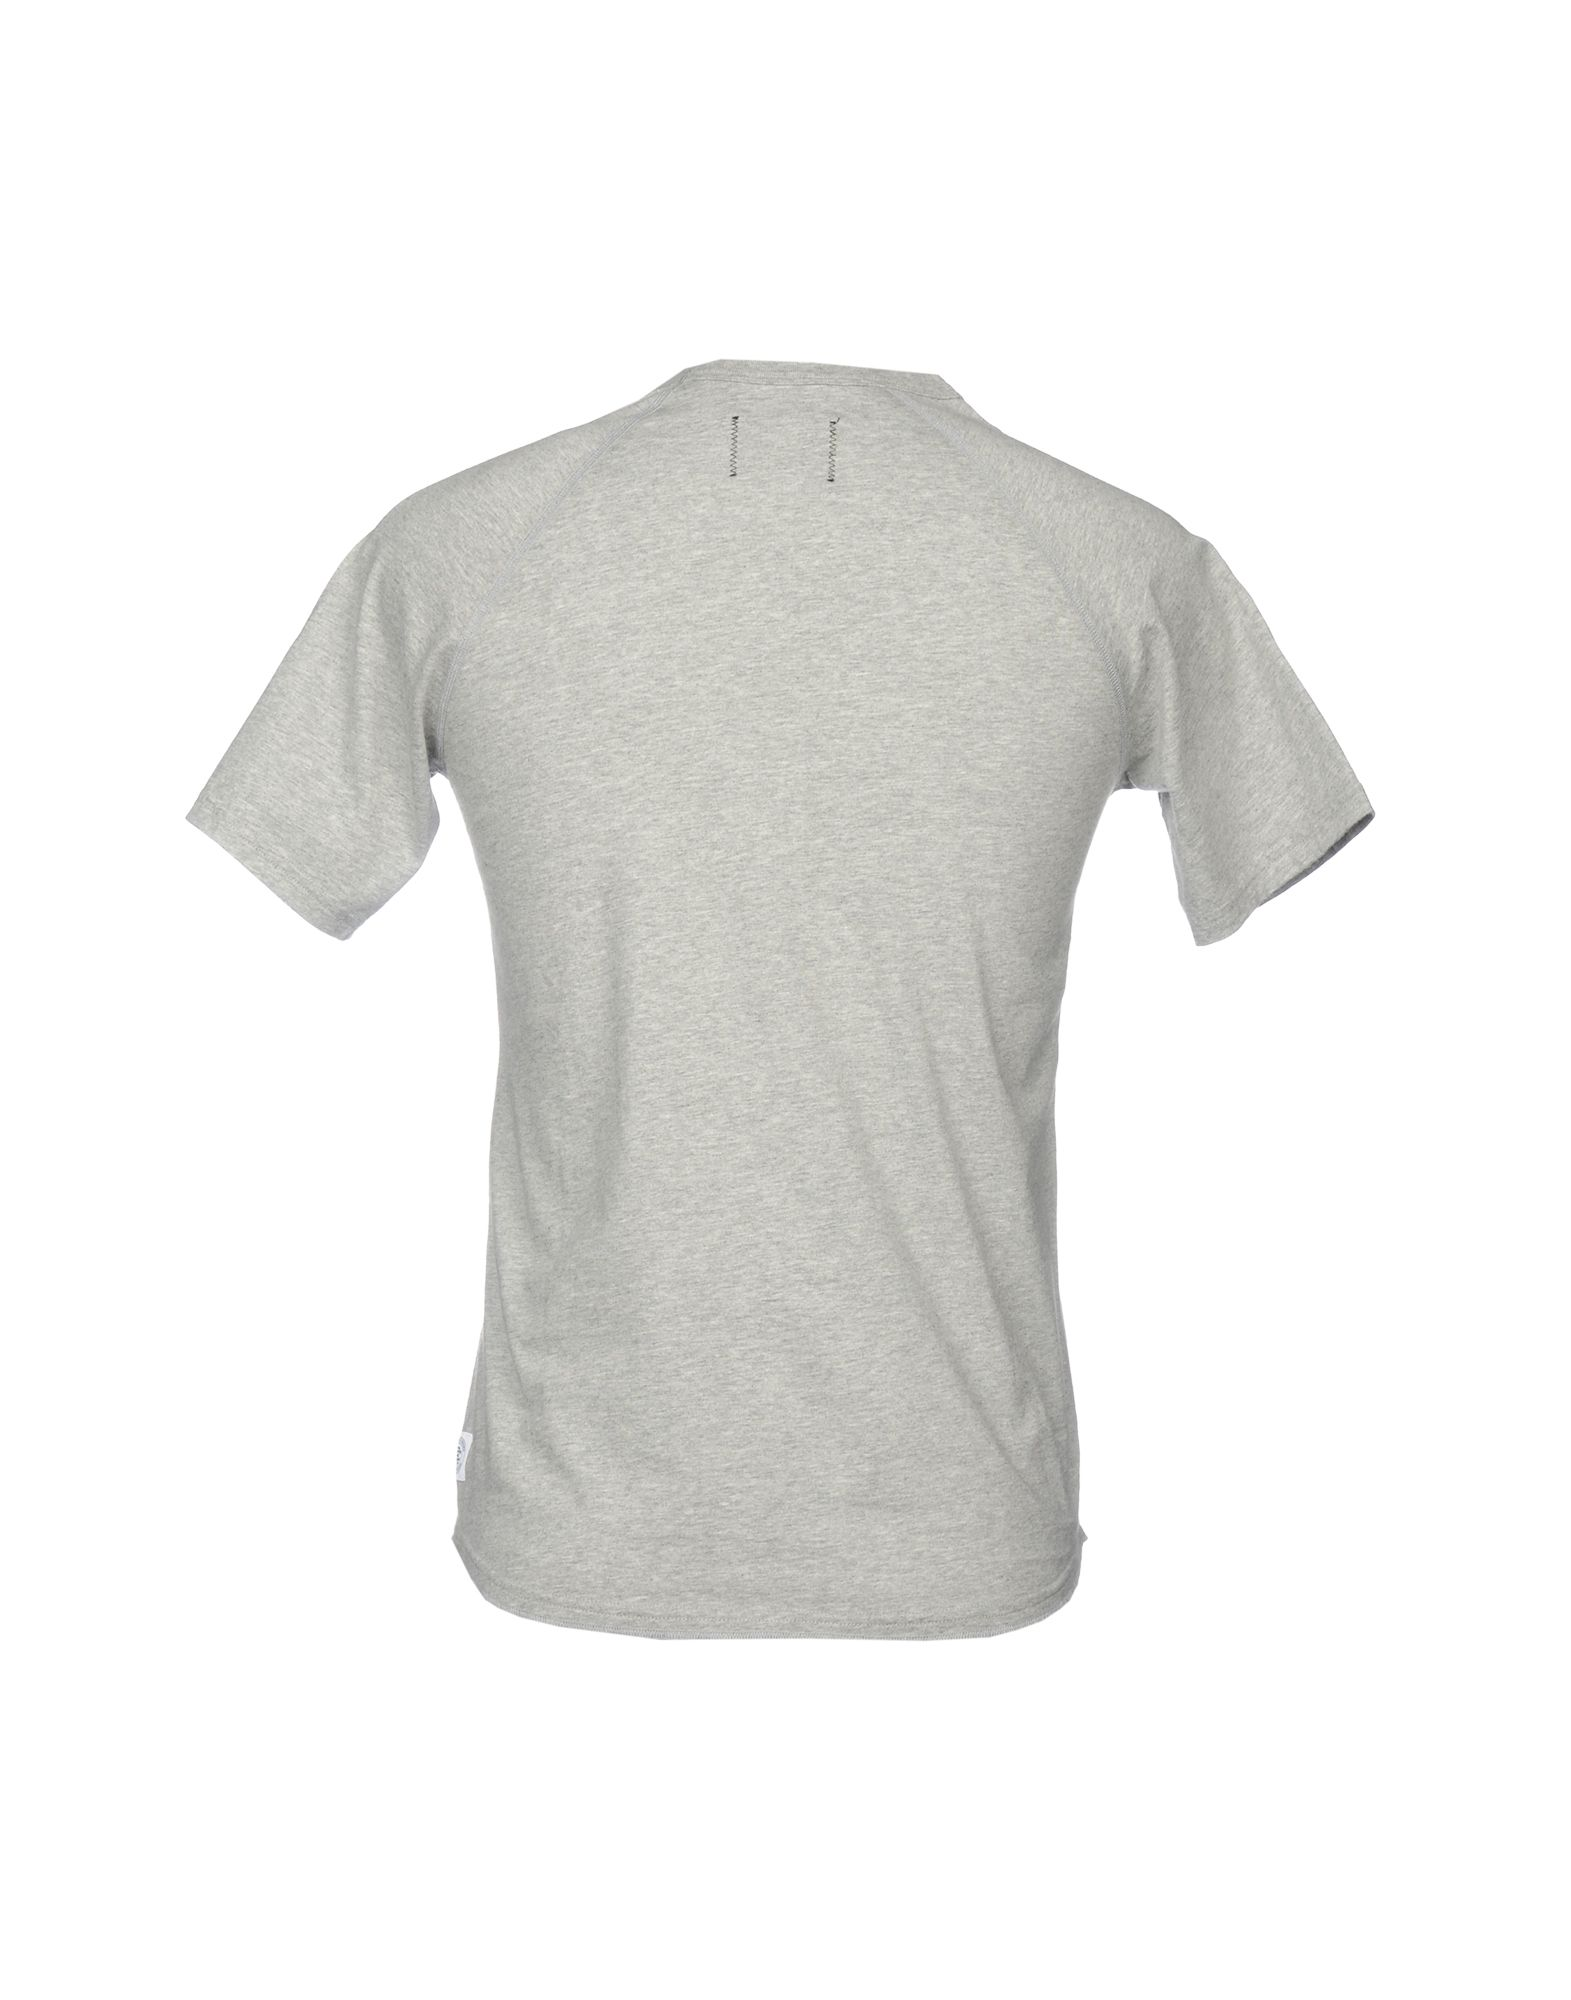 T-Shirt Champ Reigning Champ T-Shirt Uomo - 12057847XX dcdb62